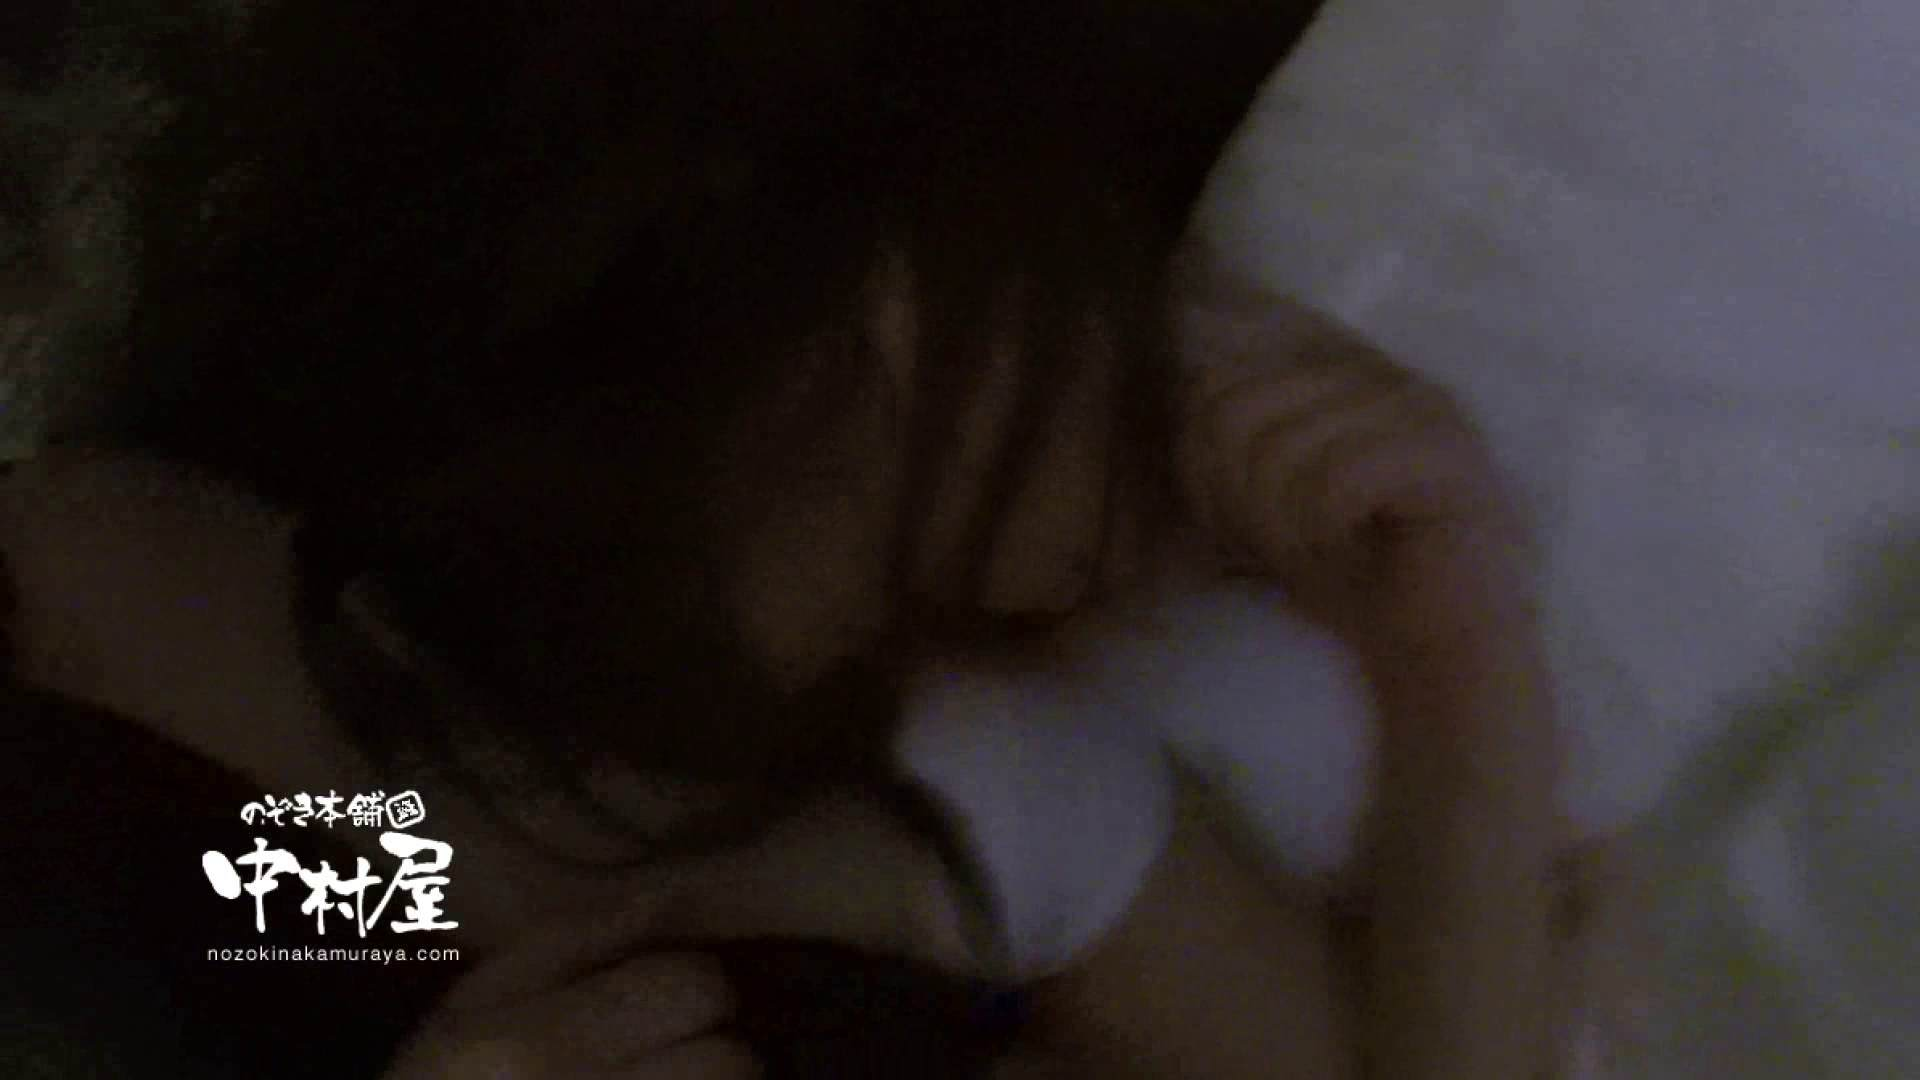 鬼畜 vol.08 極悪!妊娠覚悟の中出し! 後編 鬼畜  47Pix 35